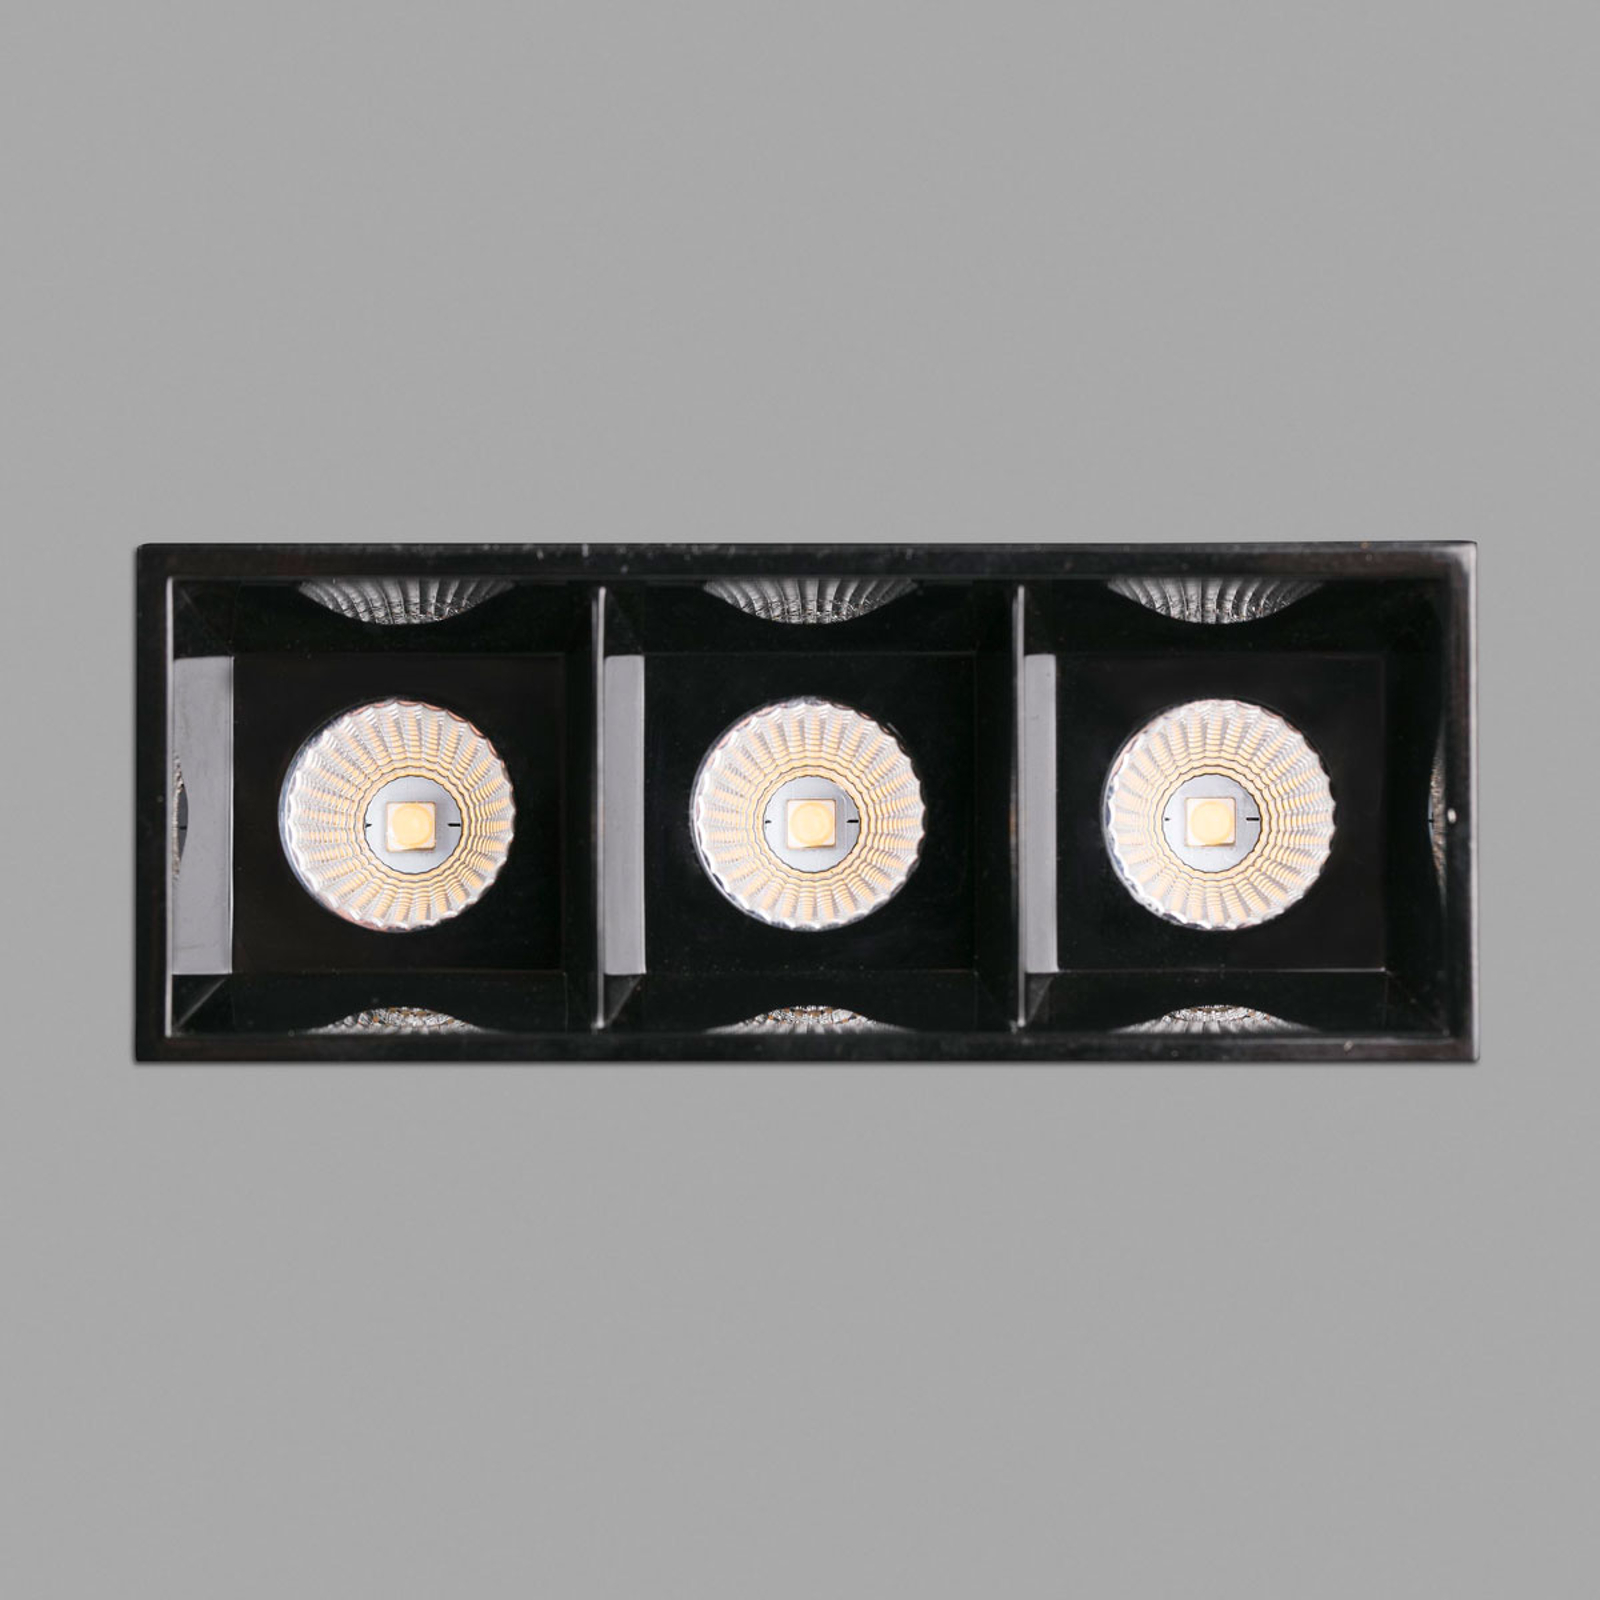 Acquista Spot LED incasso Troop Trimless, 3 luci